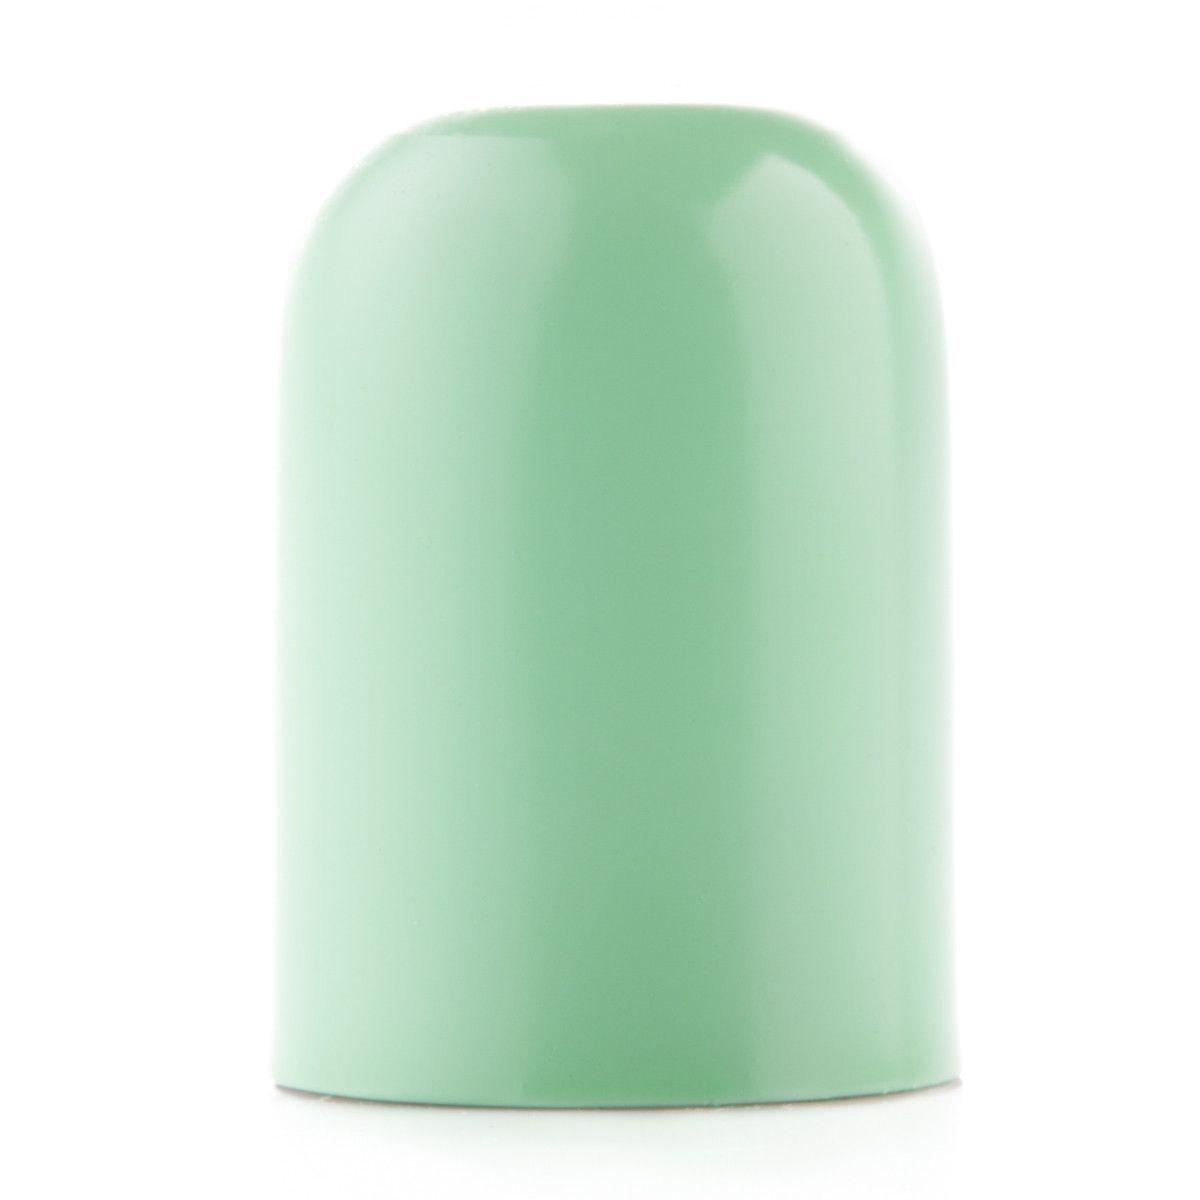 Metal Socket Cover - Mint Green